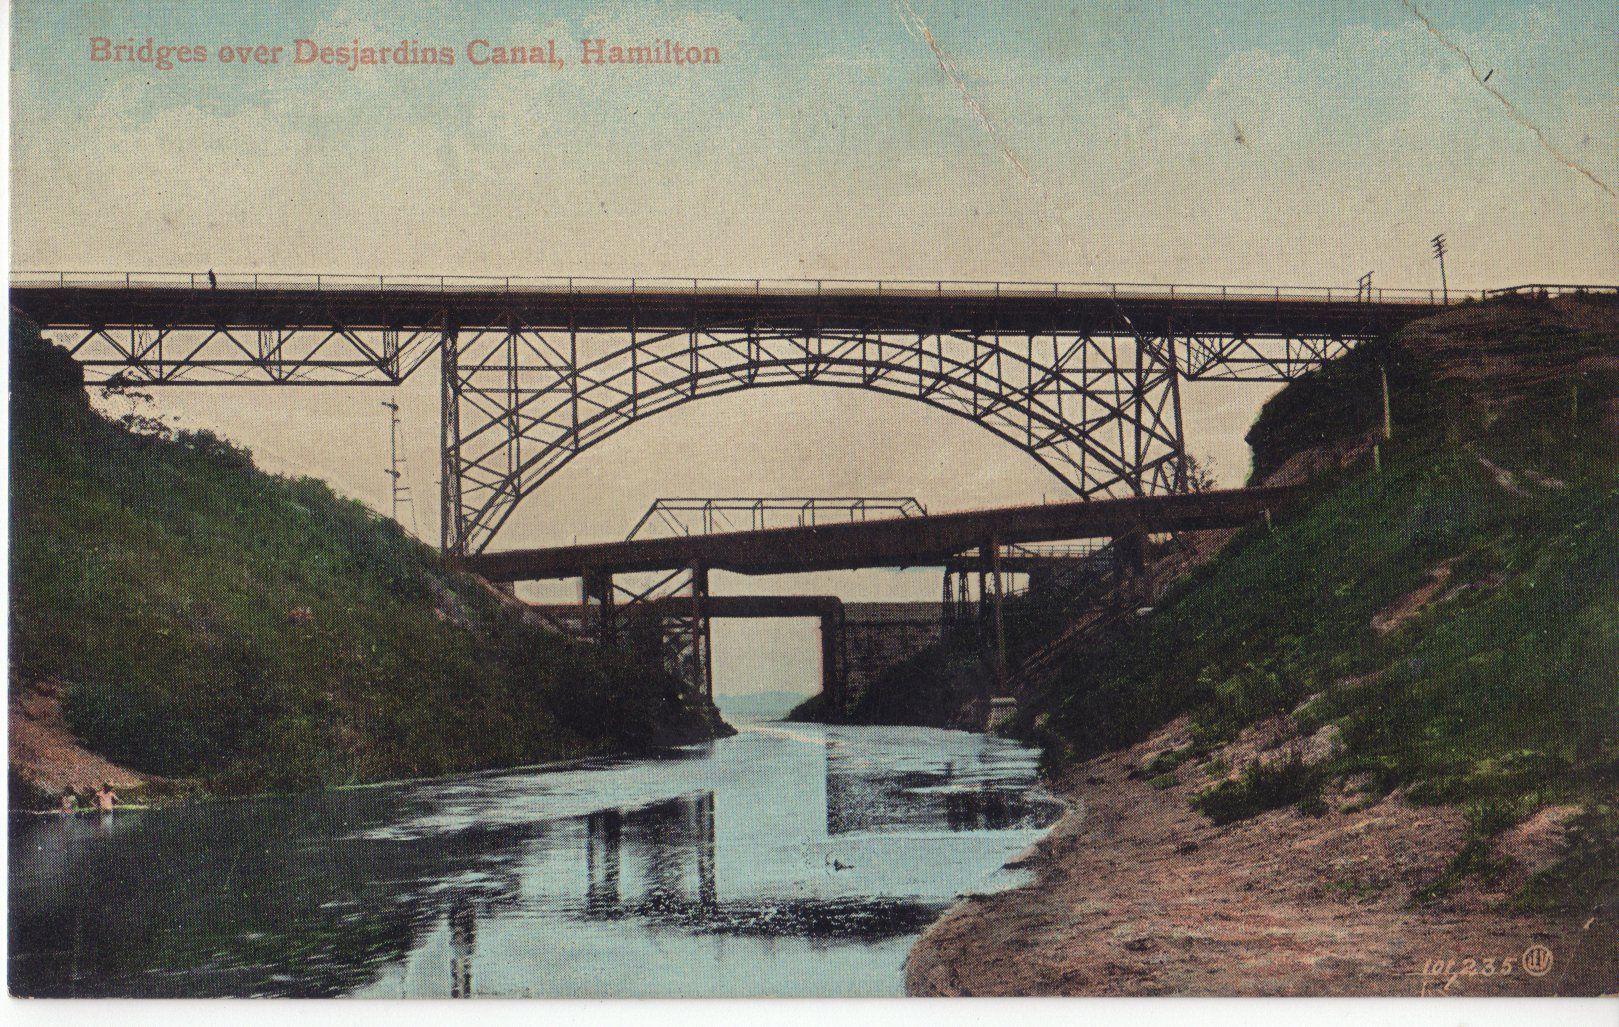 Bridges over Desjardins Canal. Postcard mailed 1908.